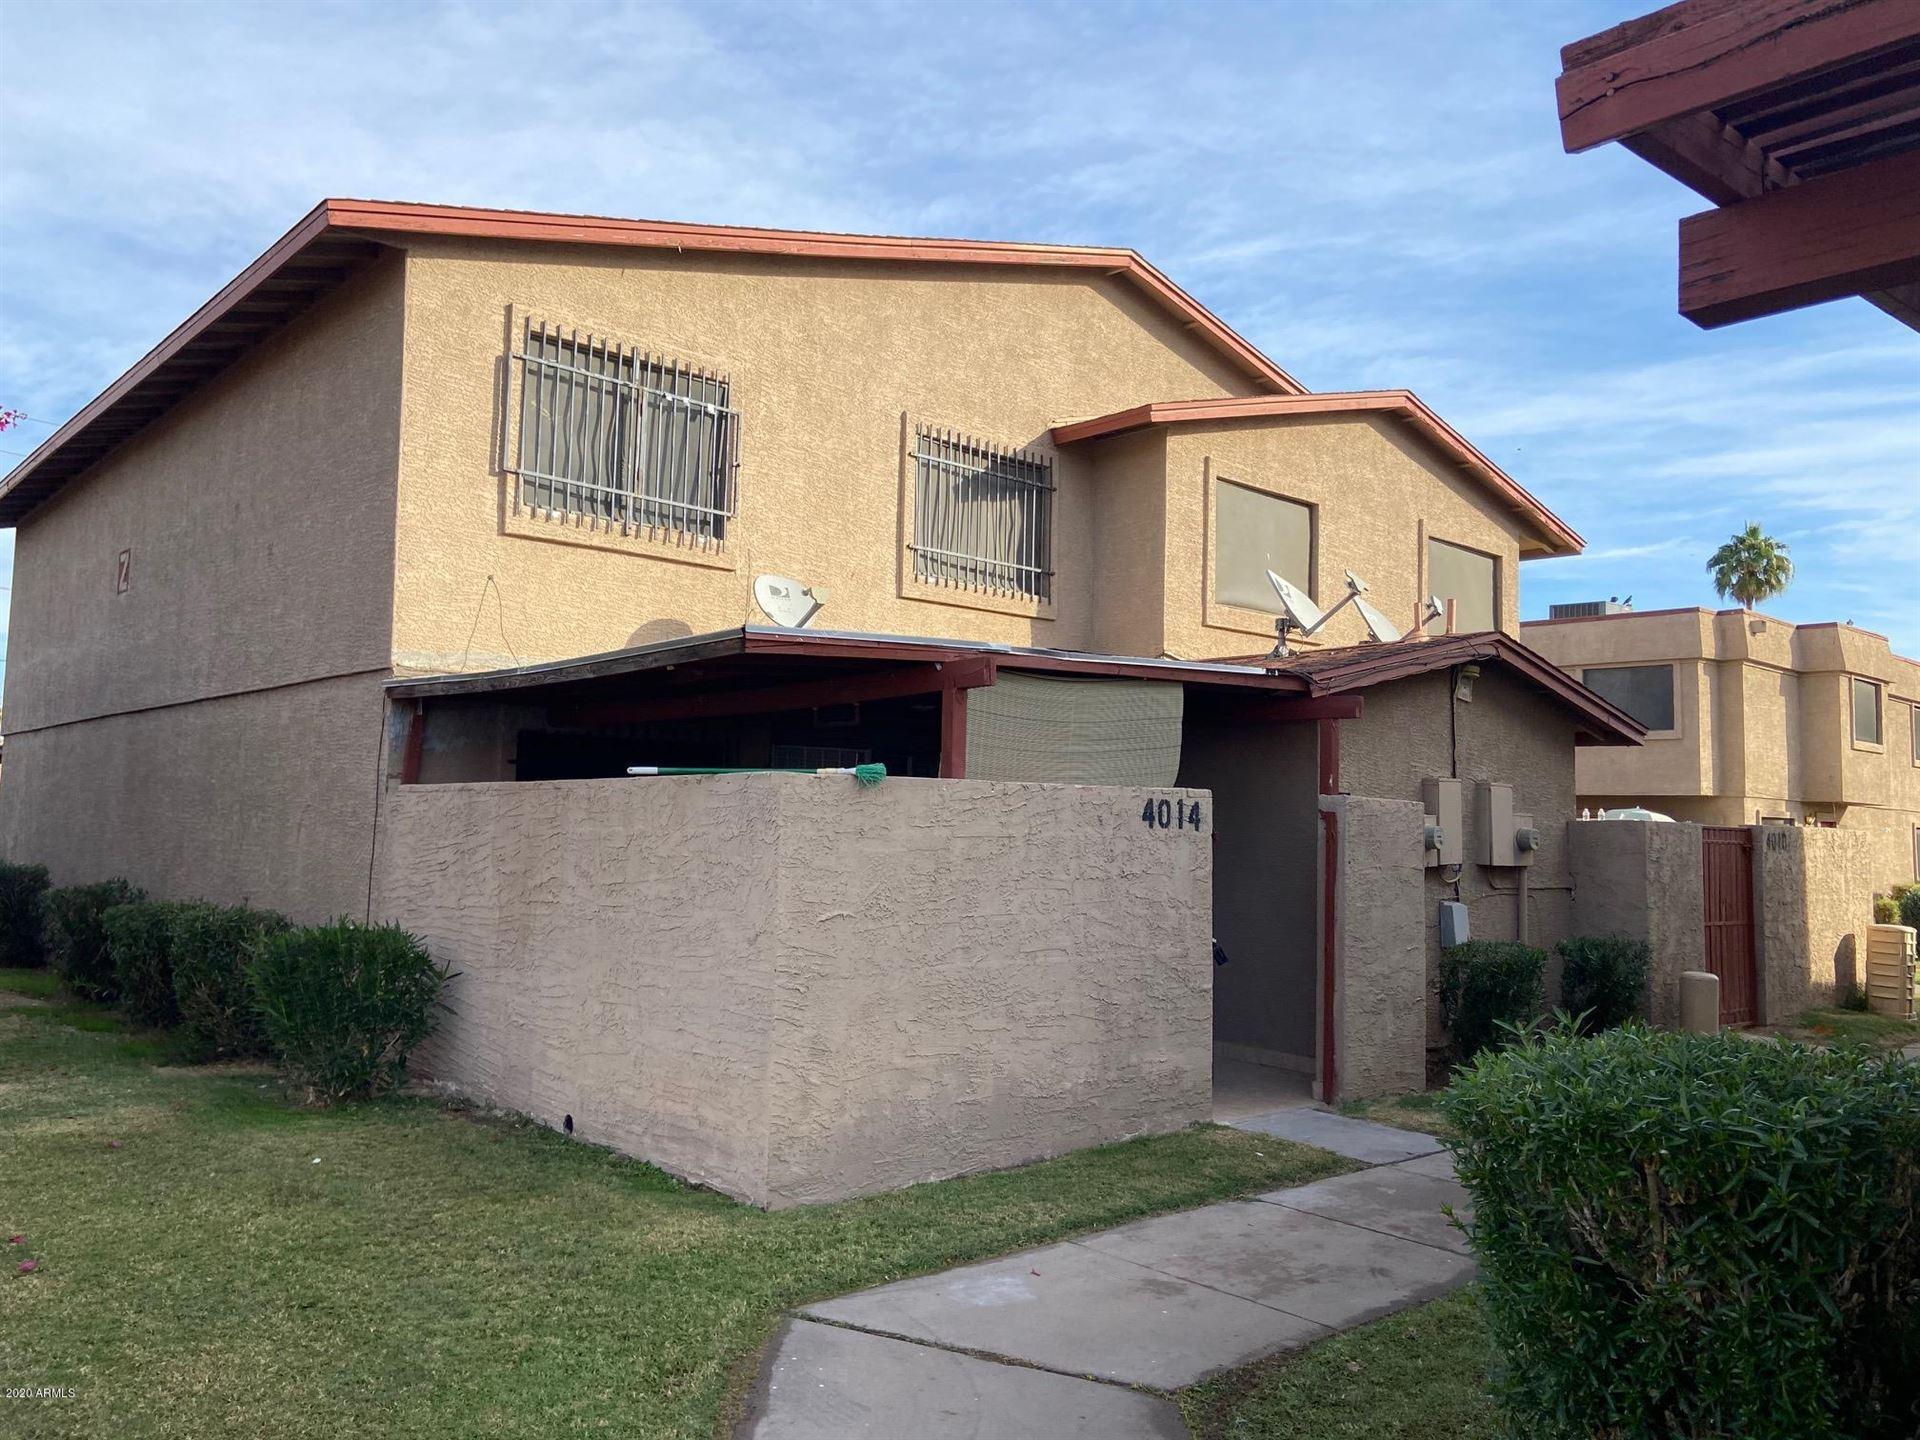 4014 W WONDERVIEW Road, Phoenix, AZ 85019 - MLS#: 6096837